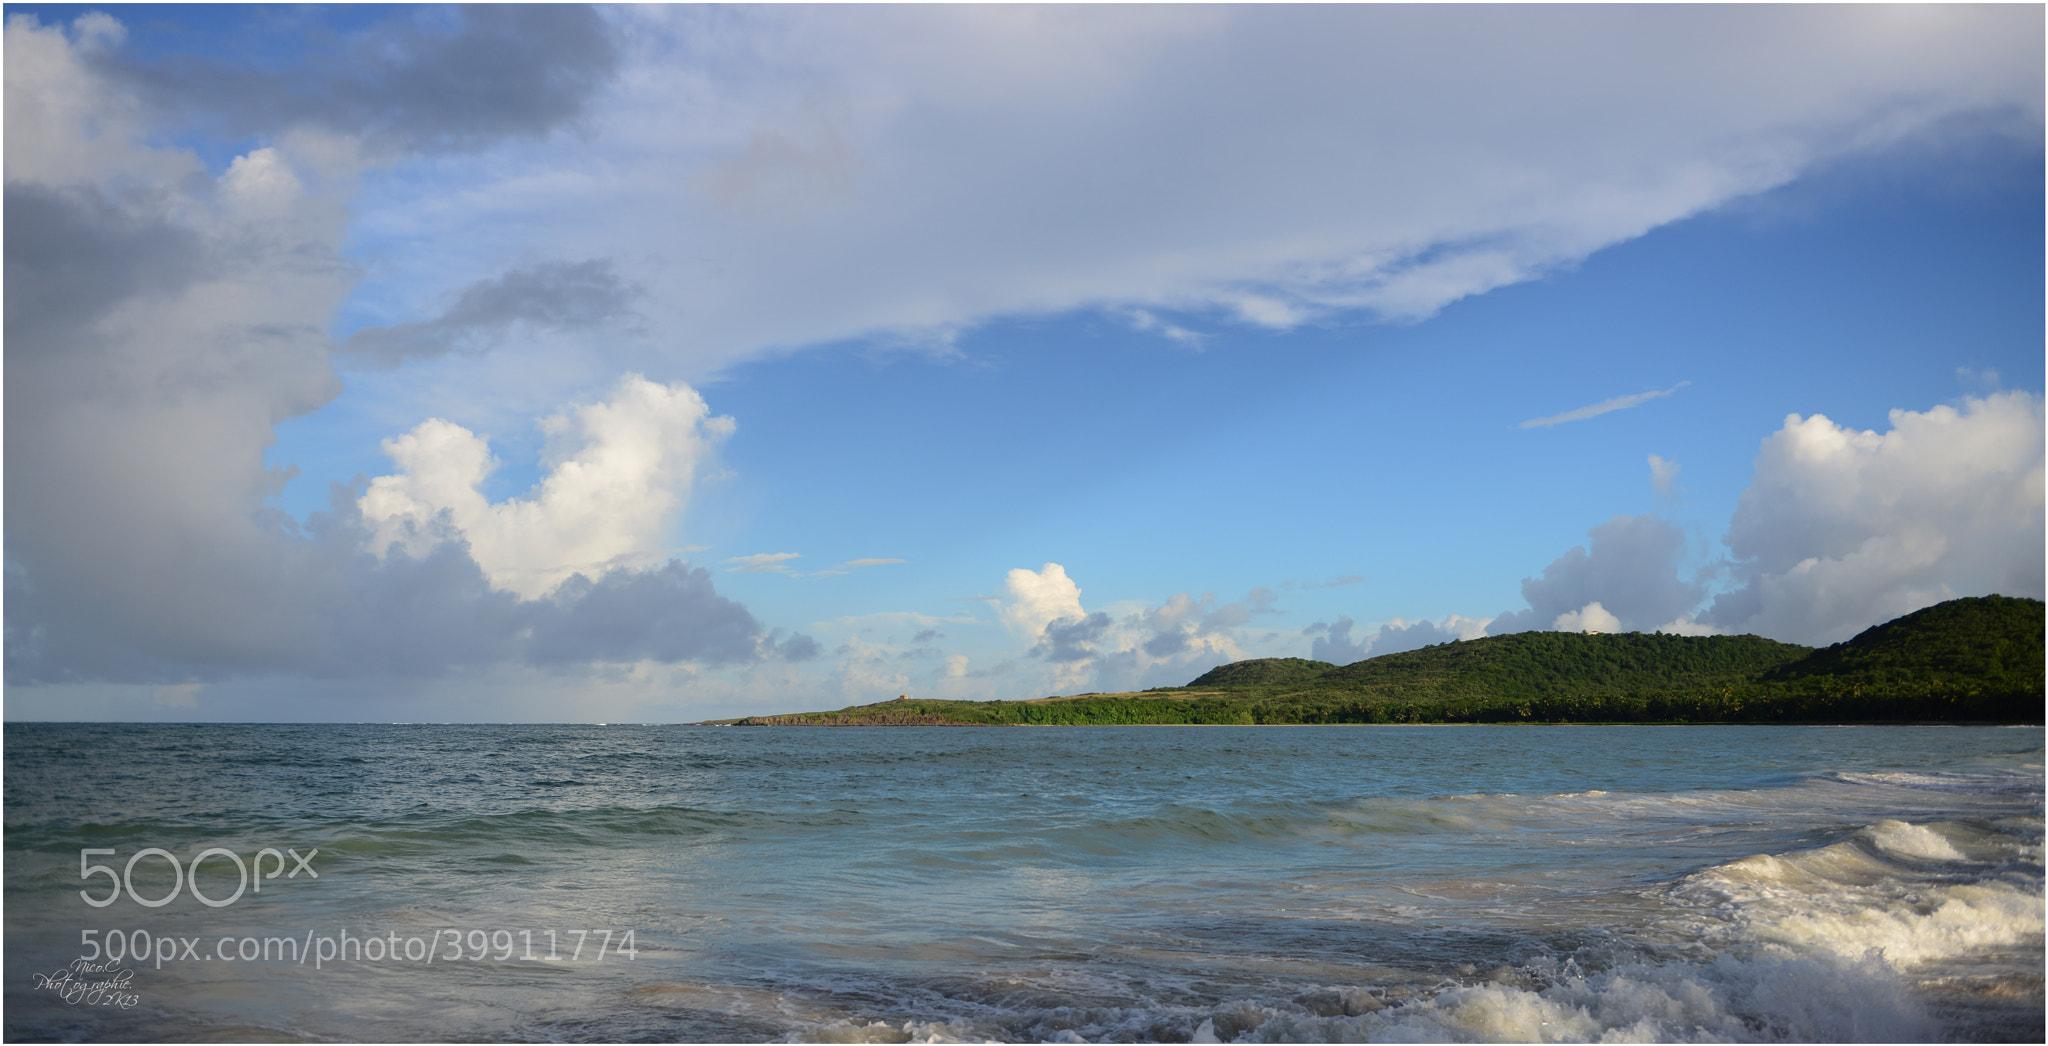 Photograph Martinique Island By Nico.C Photographie fwi by Nicolas Cama on 500px